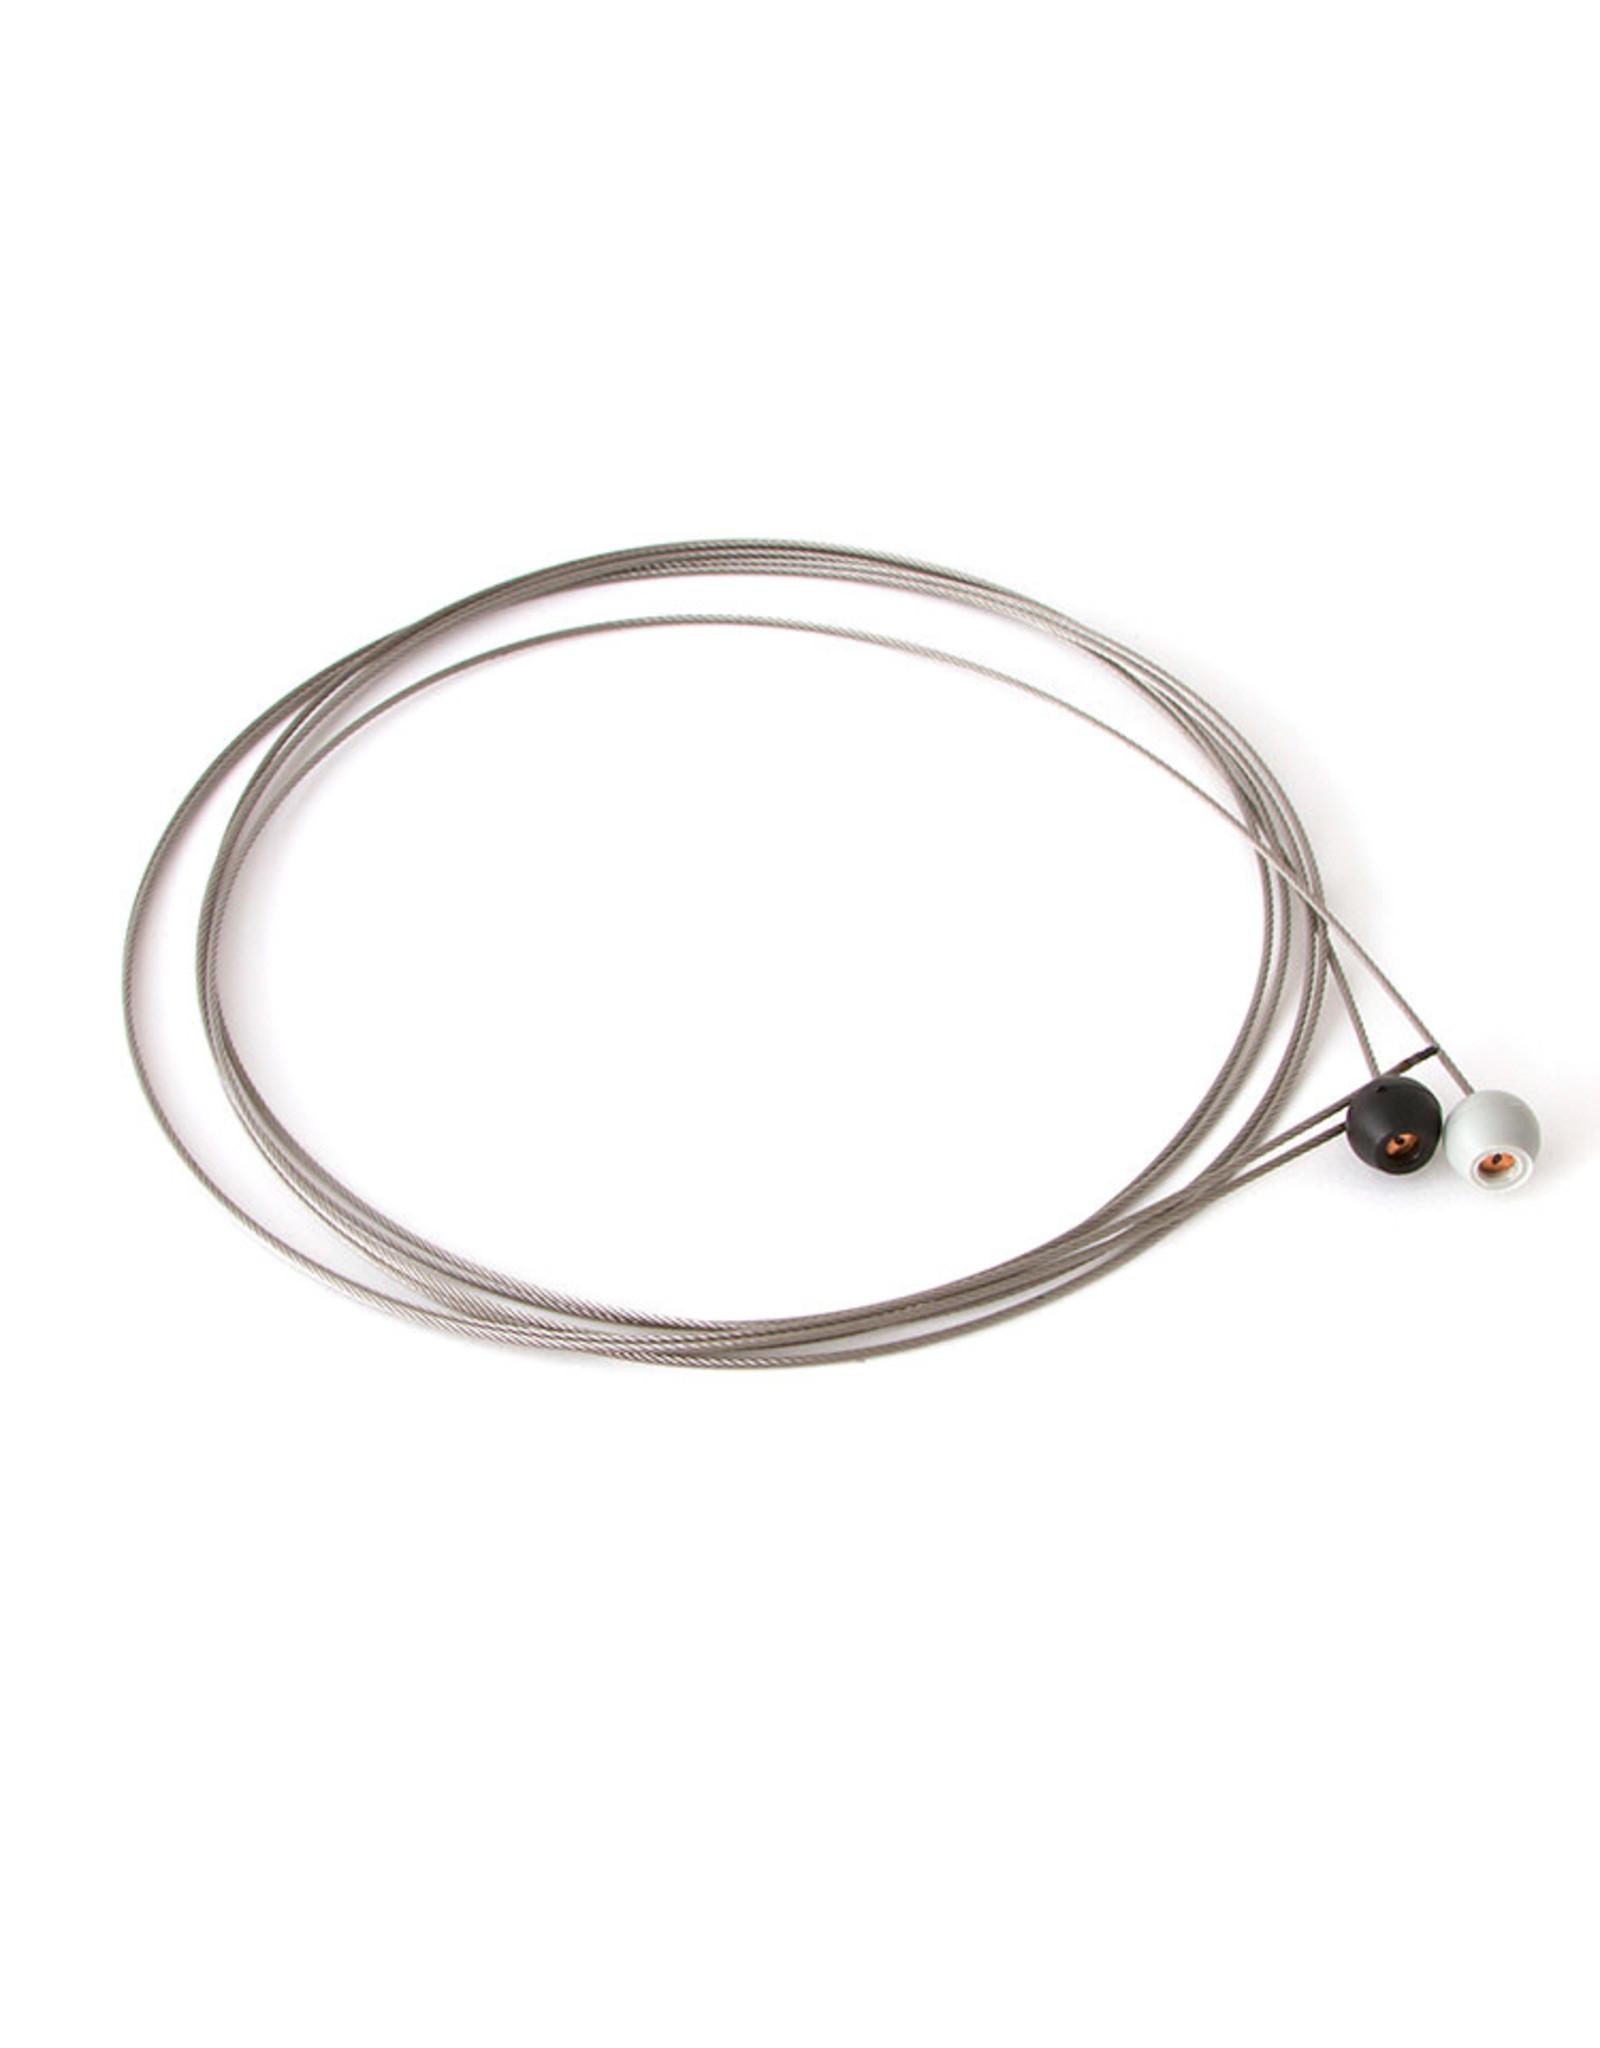 Hobie Hobie Acc. Eclipse Cable - Wire Steering Set Eclipse